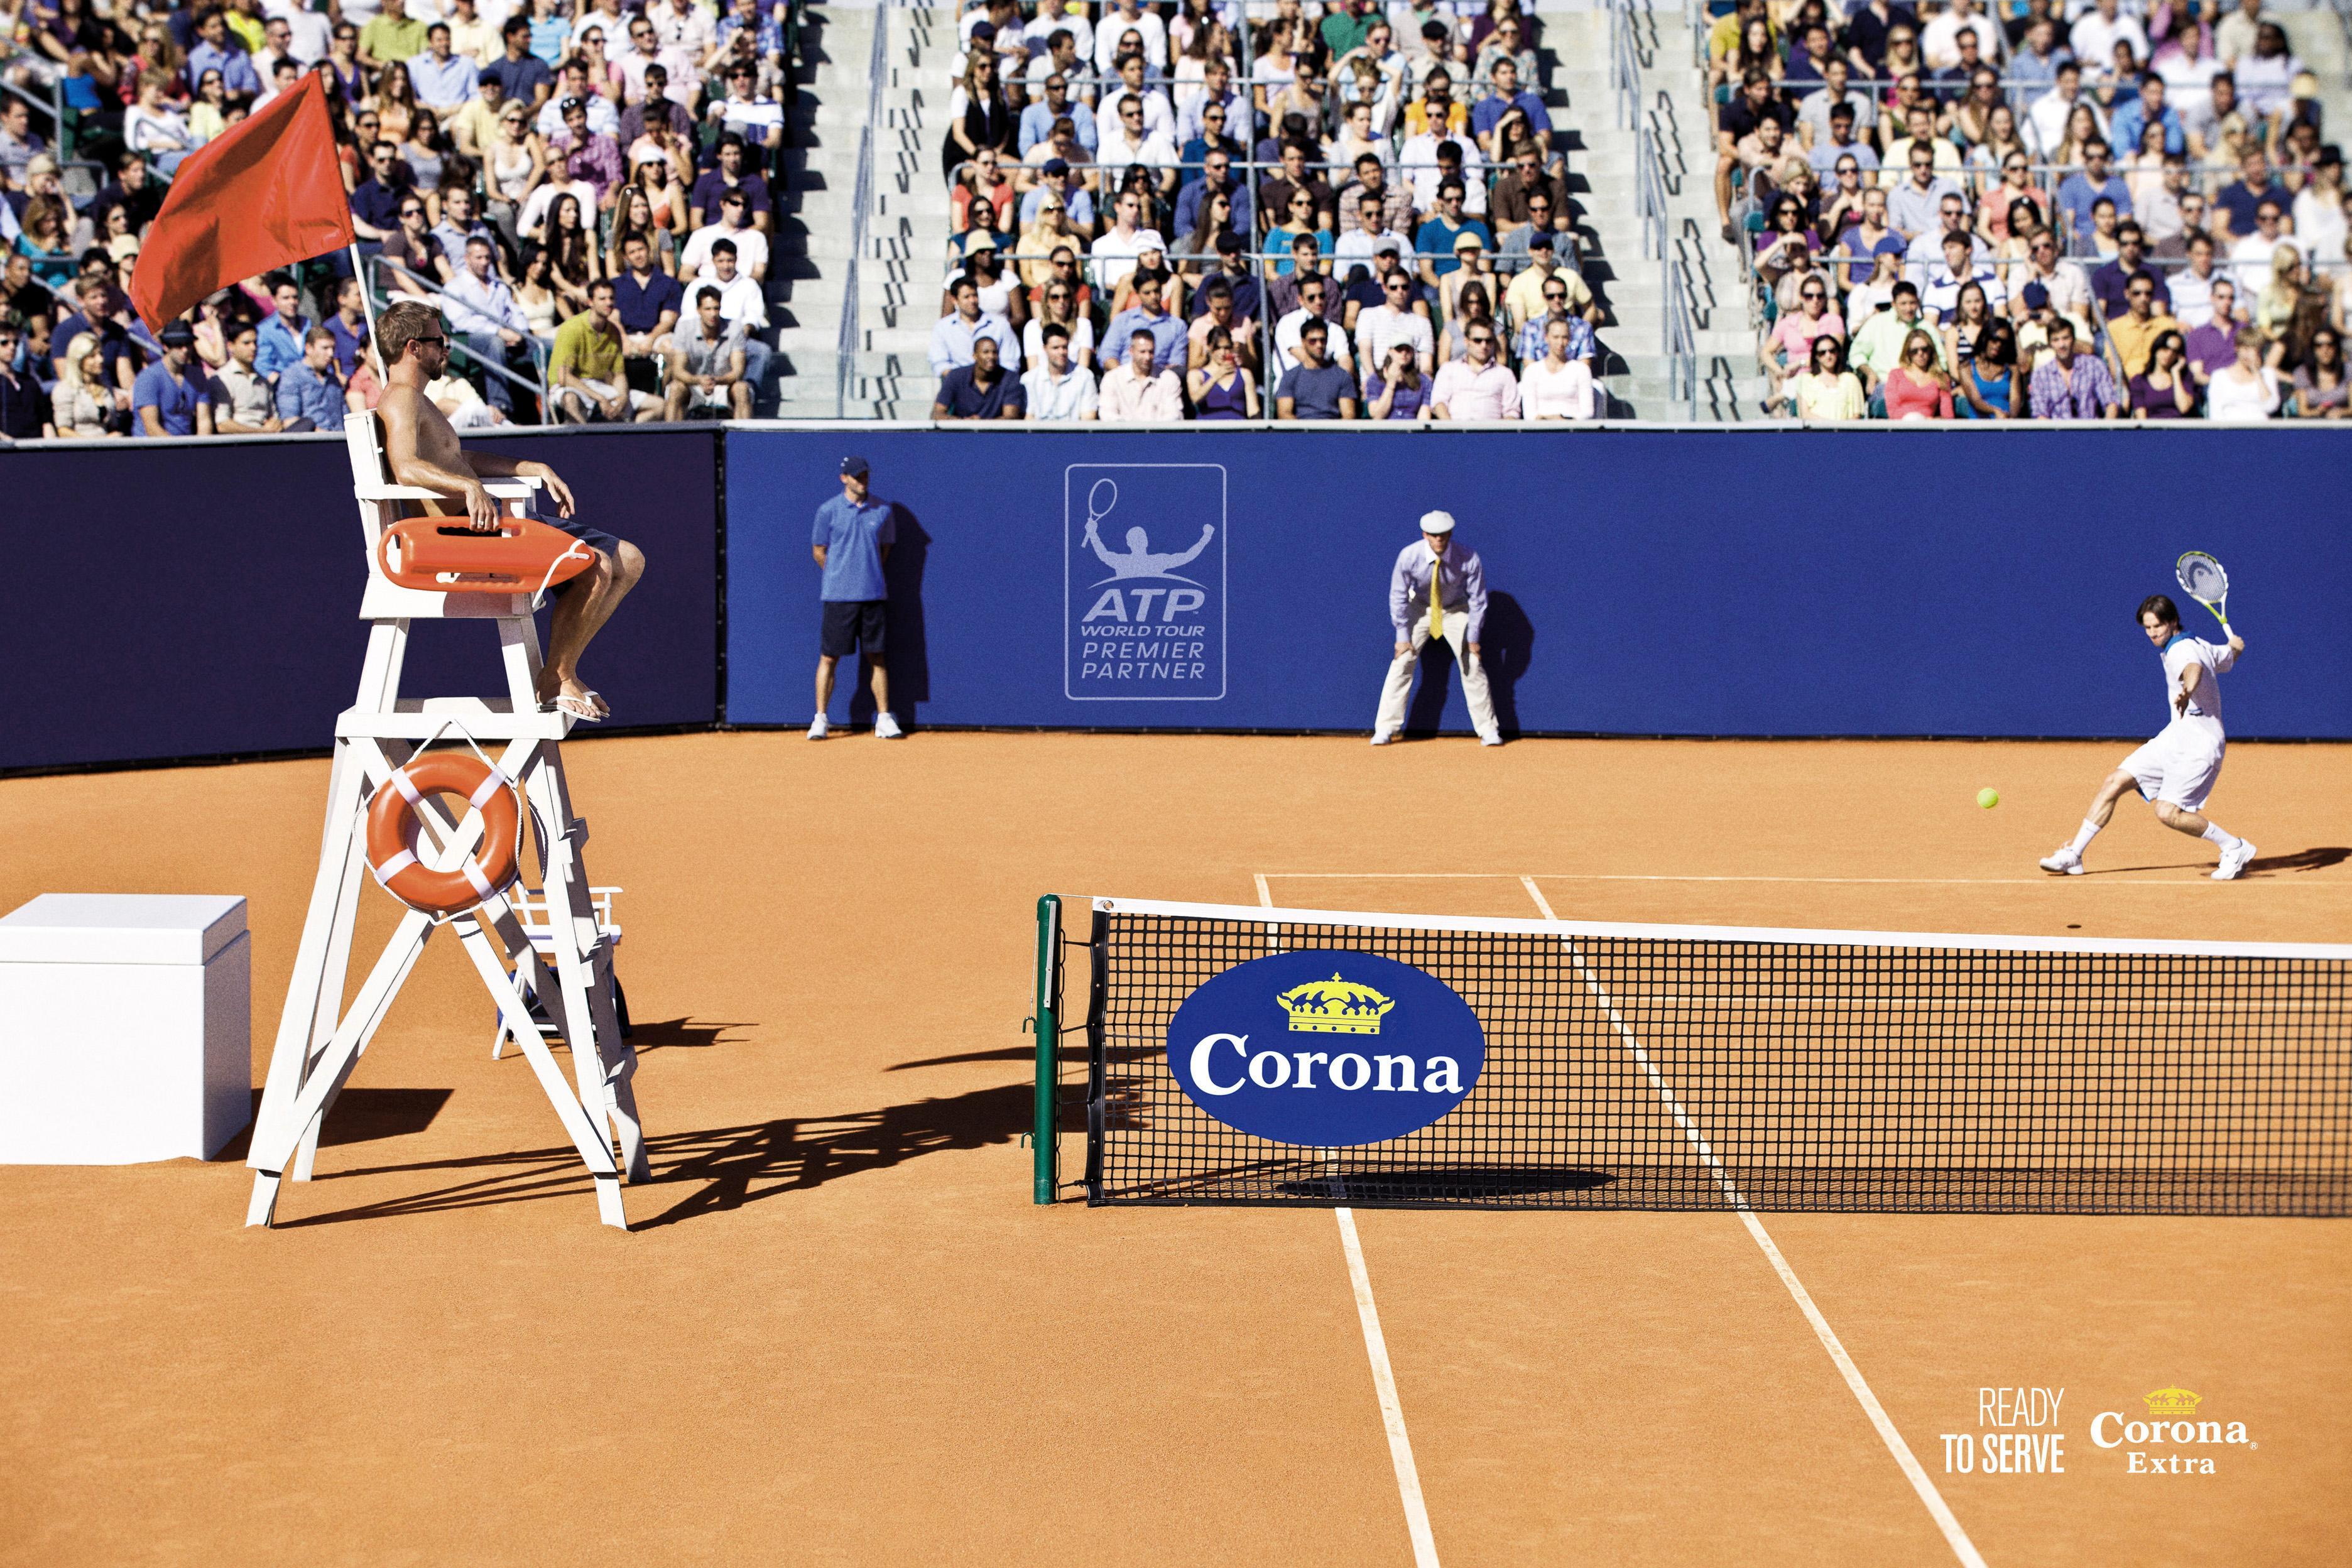 ATP world tour - Corona